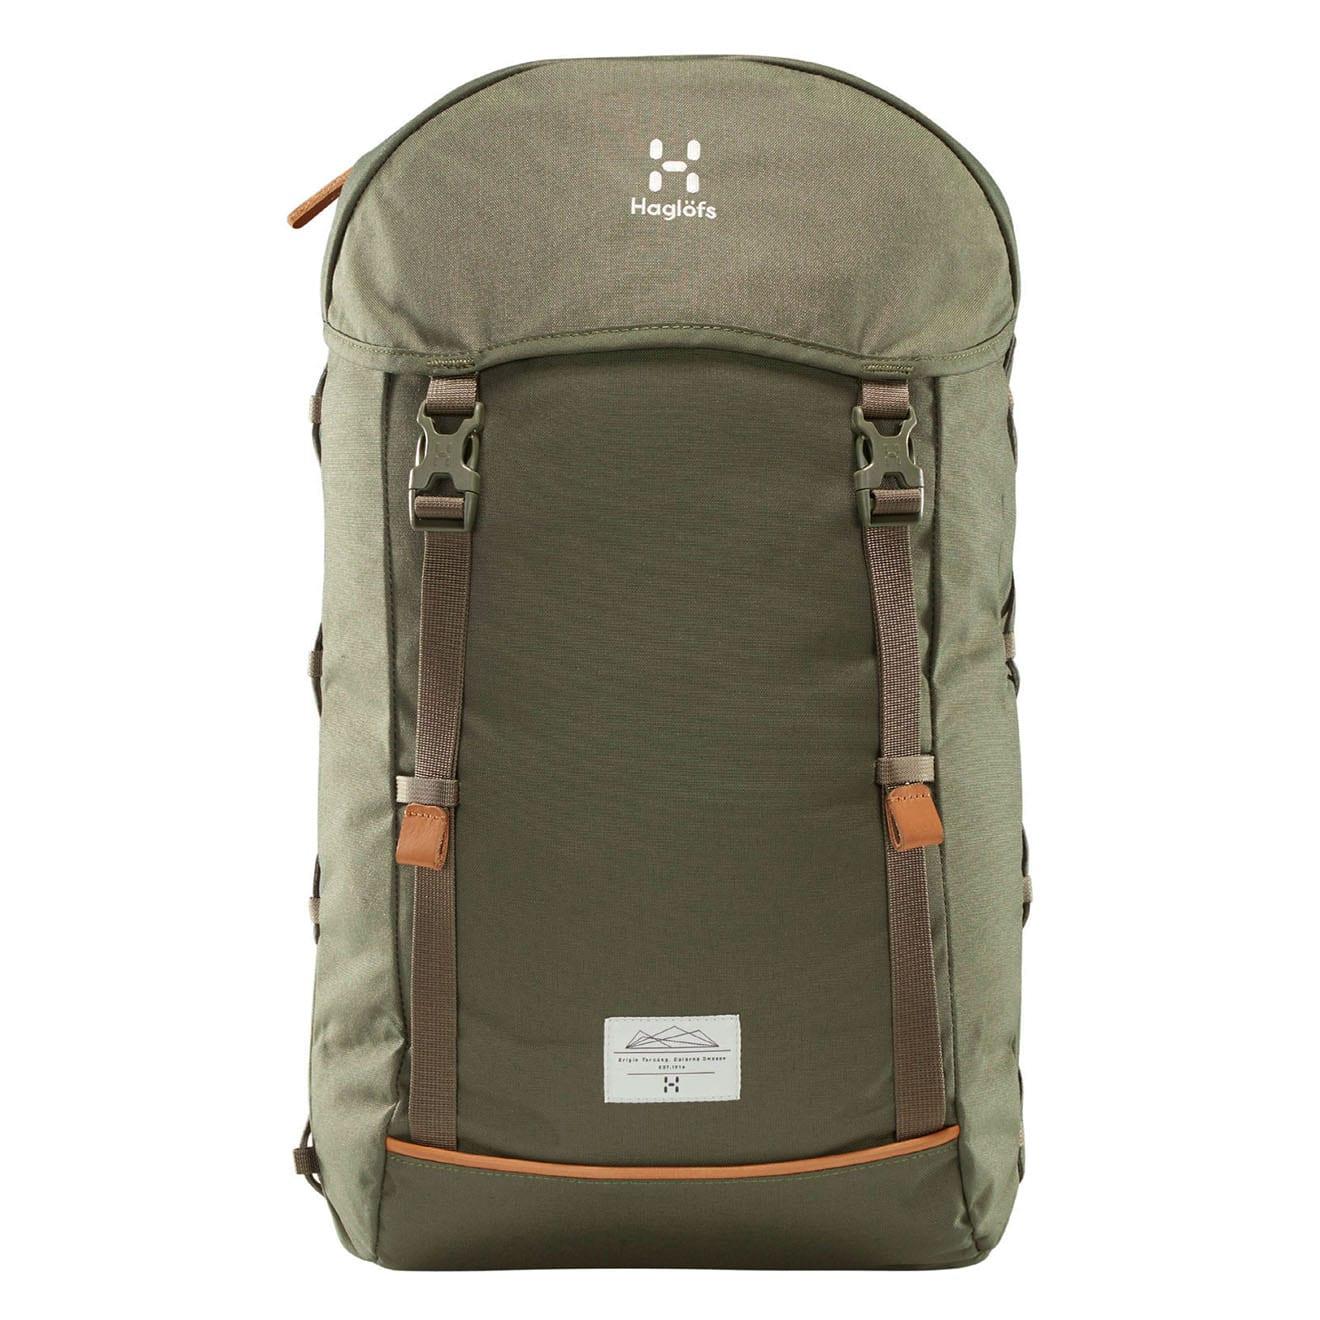 Haglofs Shosho Medium Backpack Sage Green